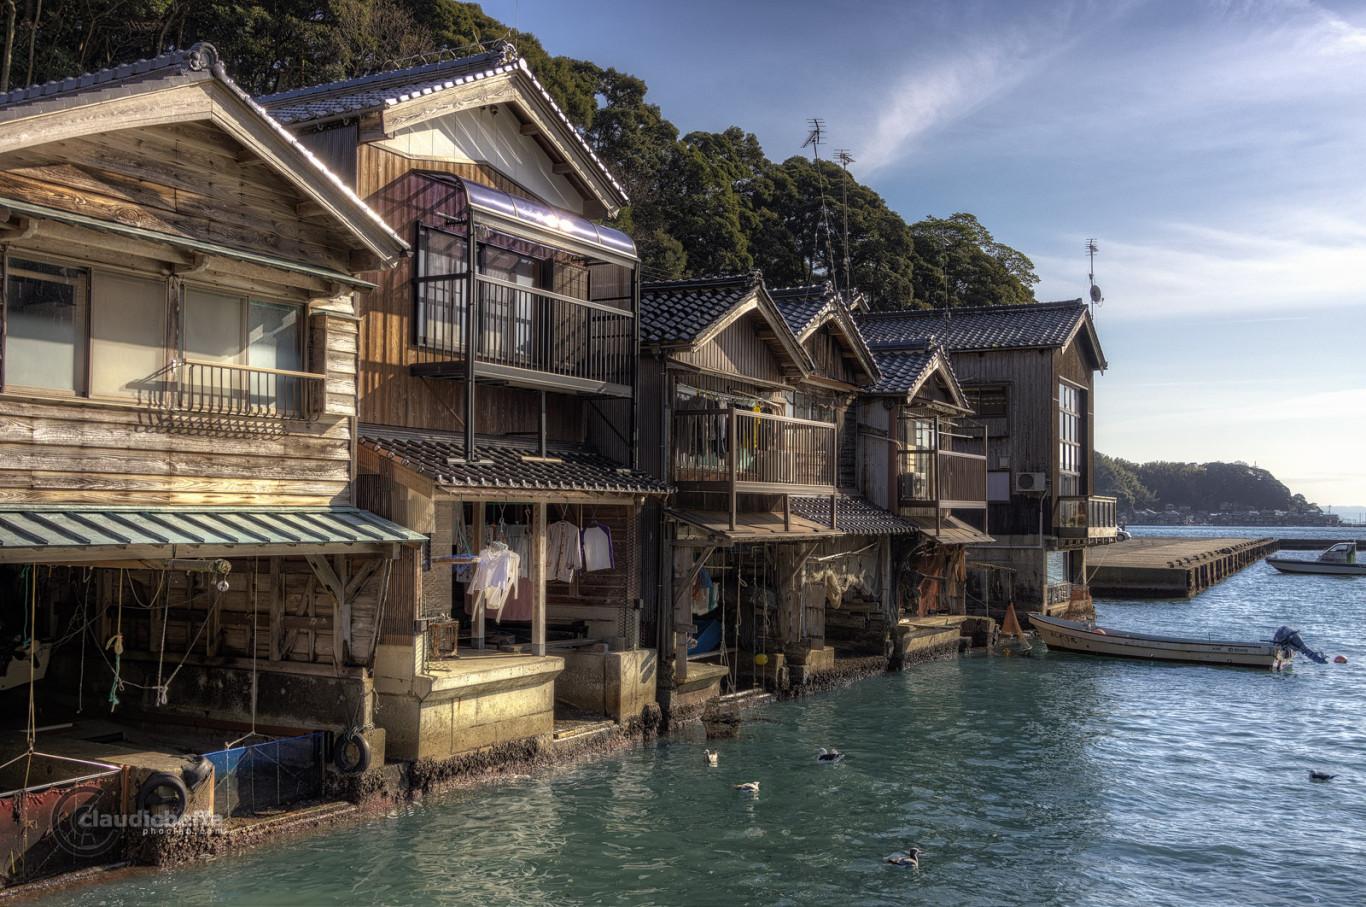 Kyoto, Inenofunaya, Houses, Fishermen, Boats, Sea, Landscape, Japan, Pentax, HDR